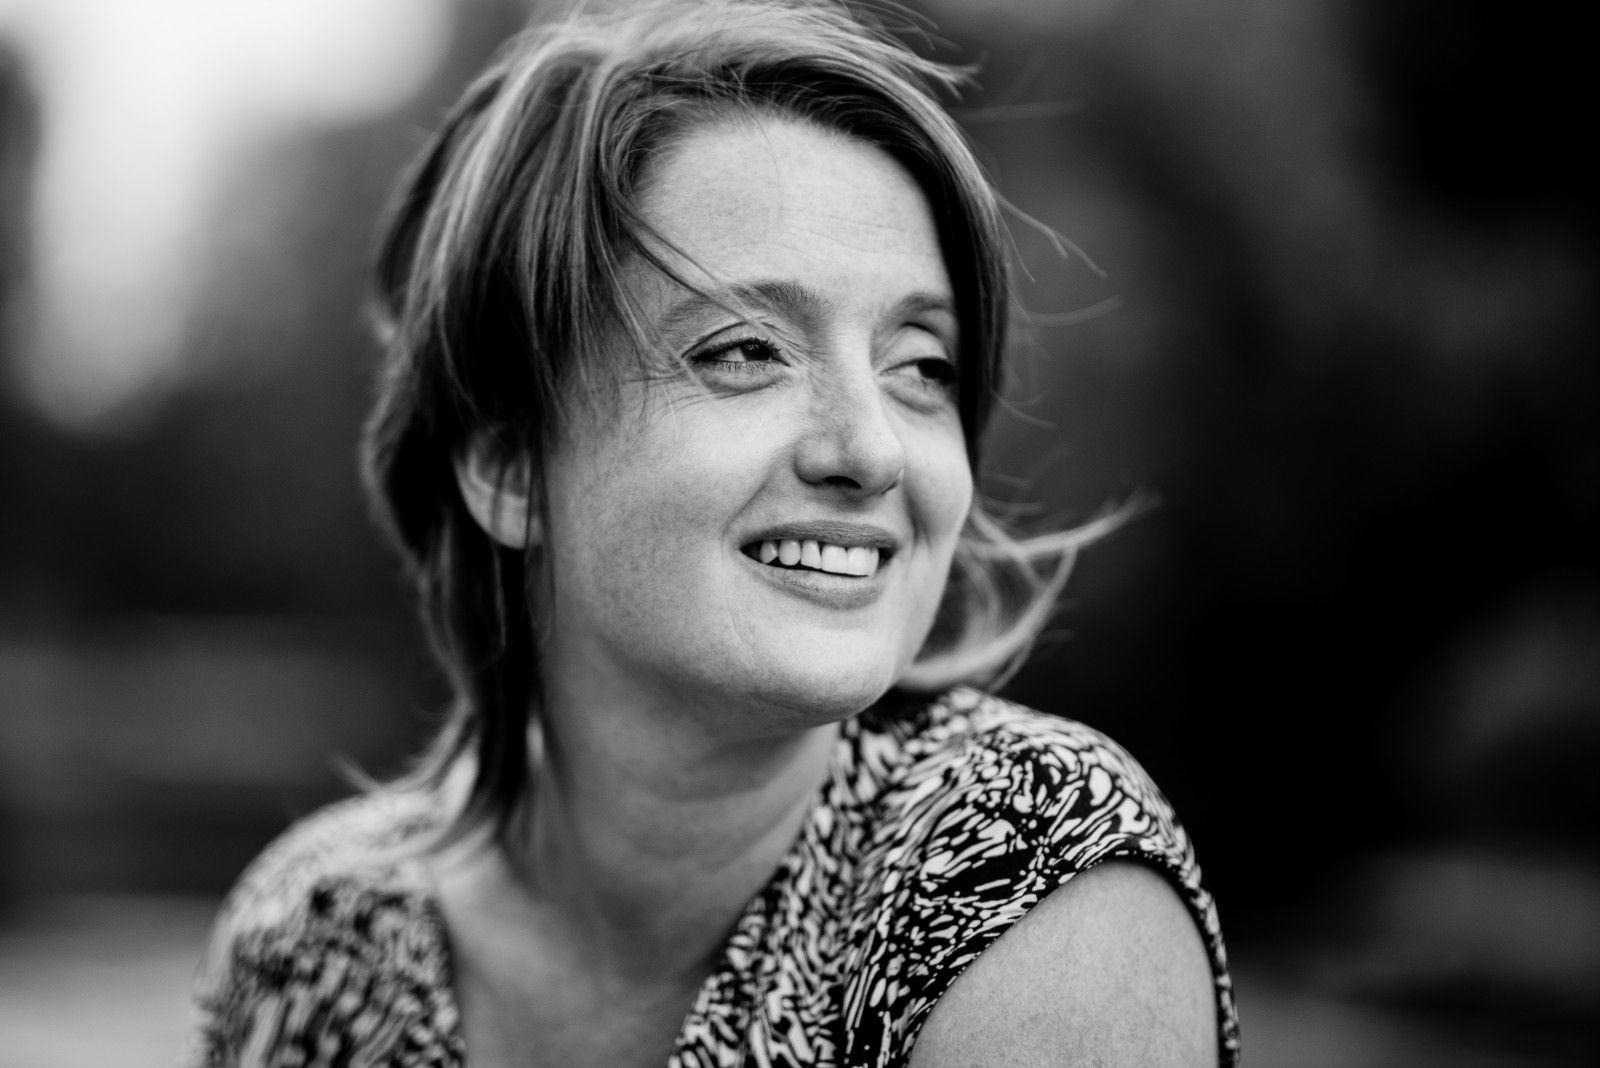 Josita Swarte Photography | Portret & profiel  | black and white portrait